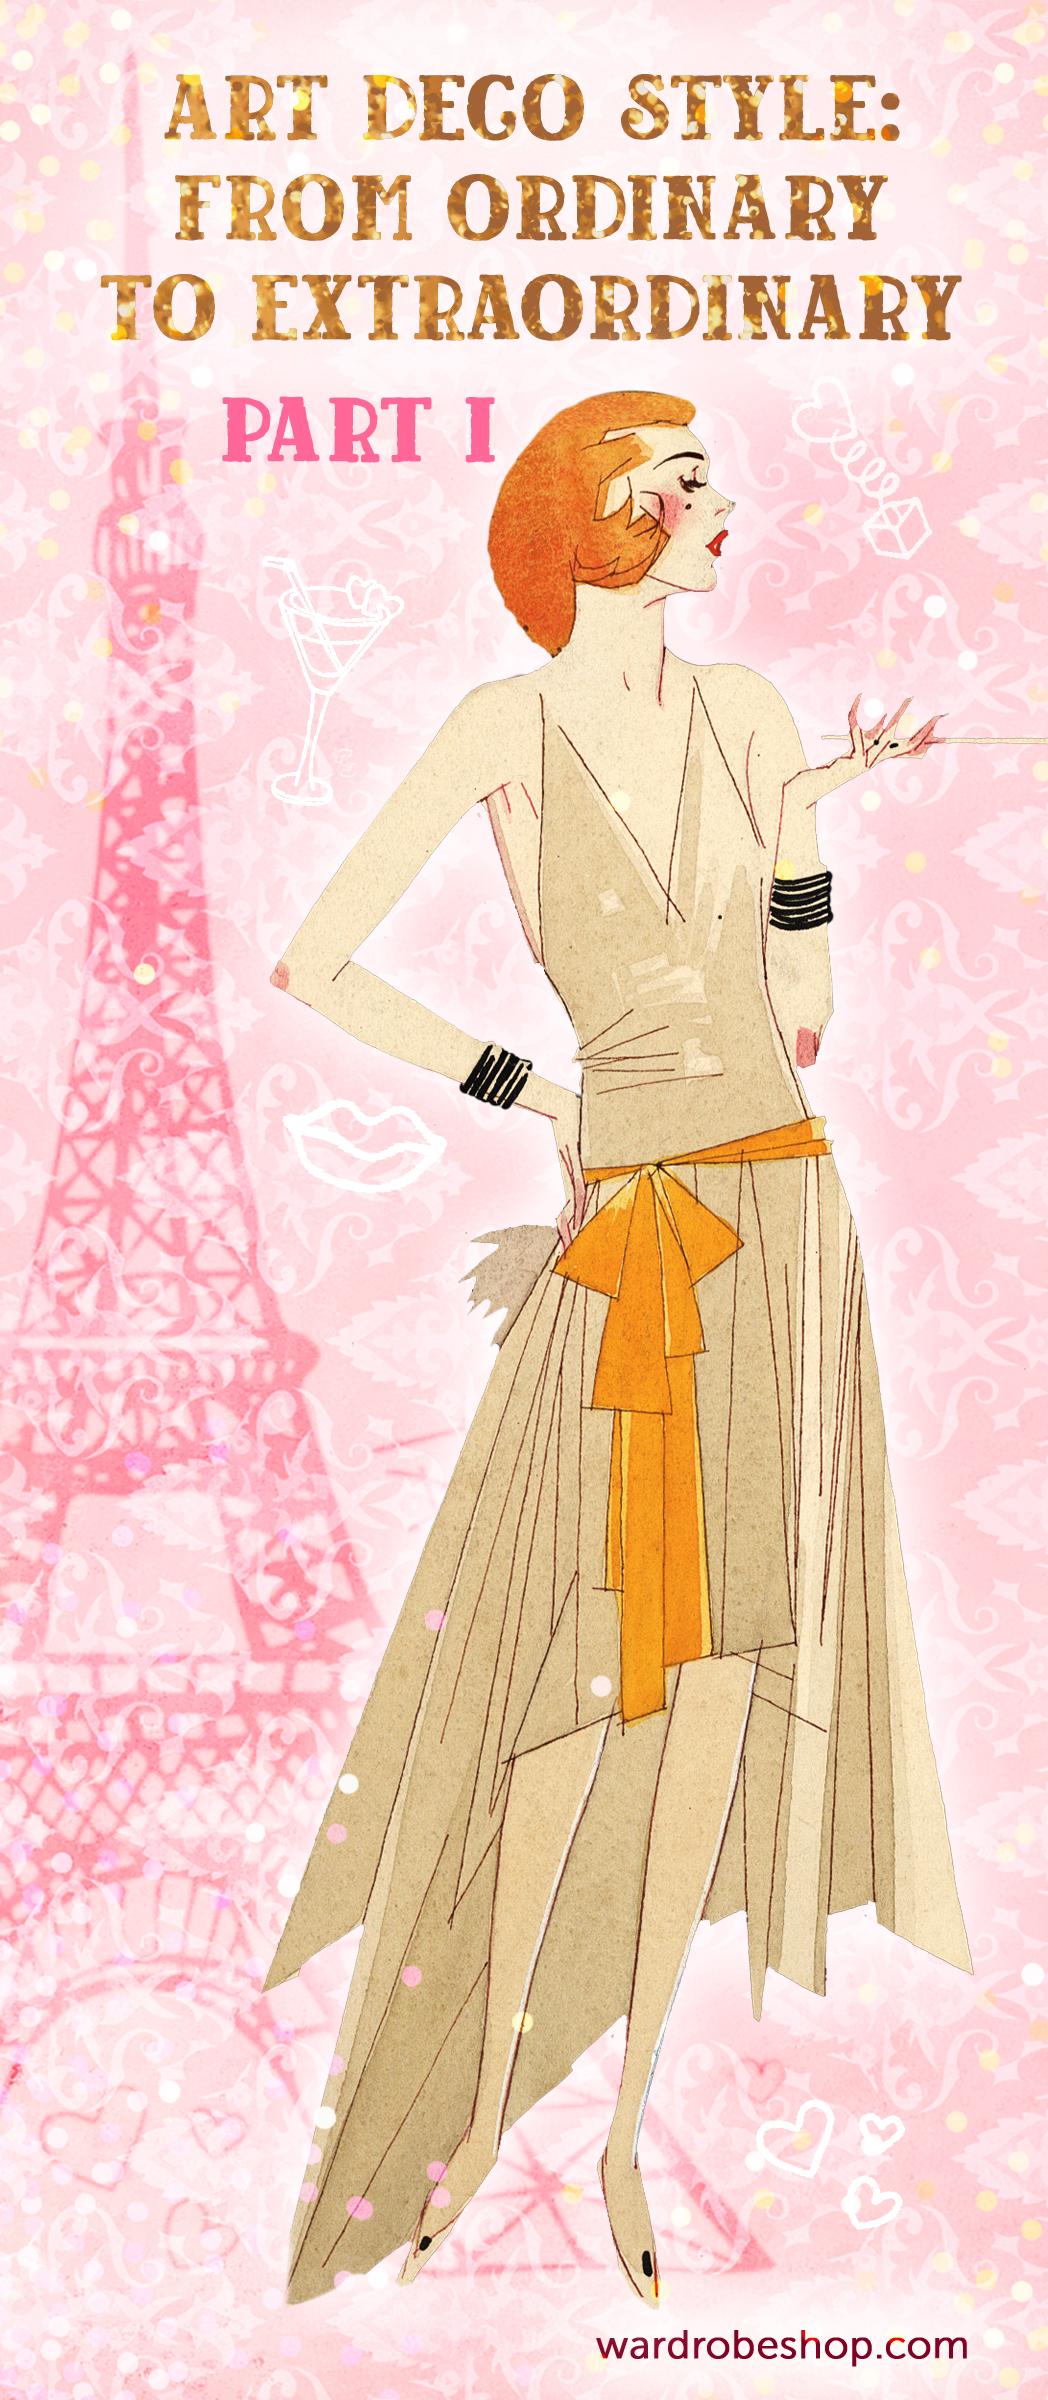 Art Deco Style From Ordinary To Extraordinary Part I Art Deco Fashion Art Deco Vintage Style Outfits